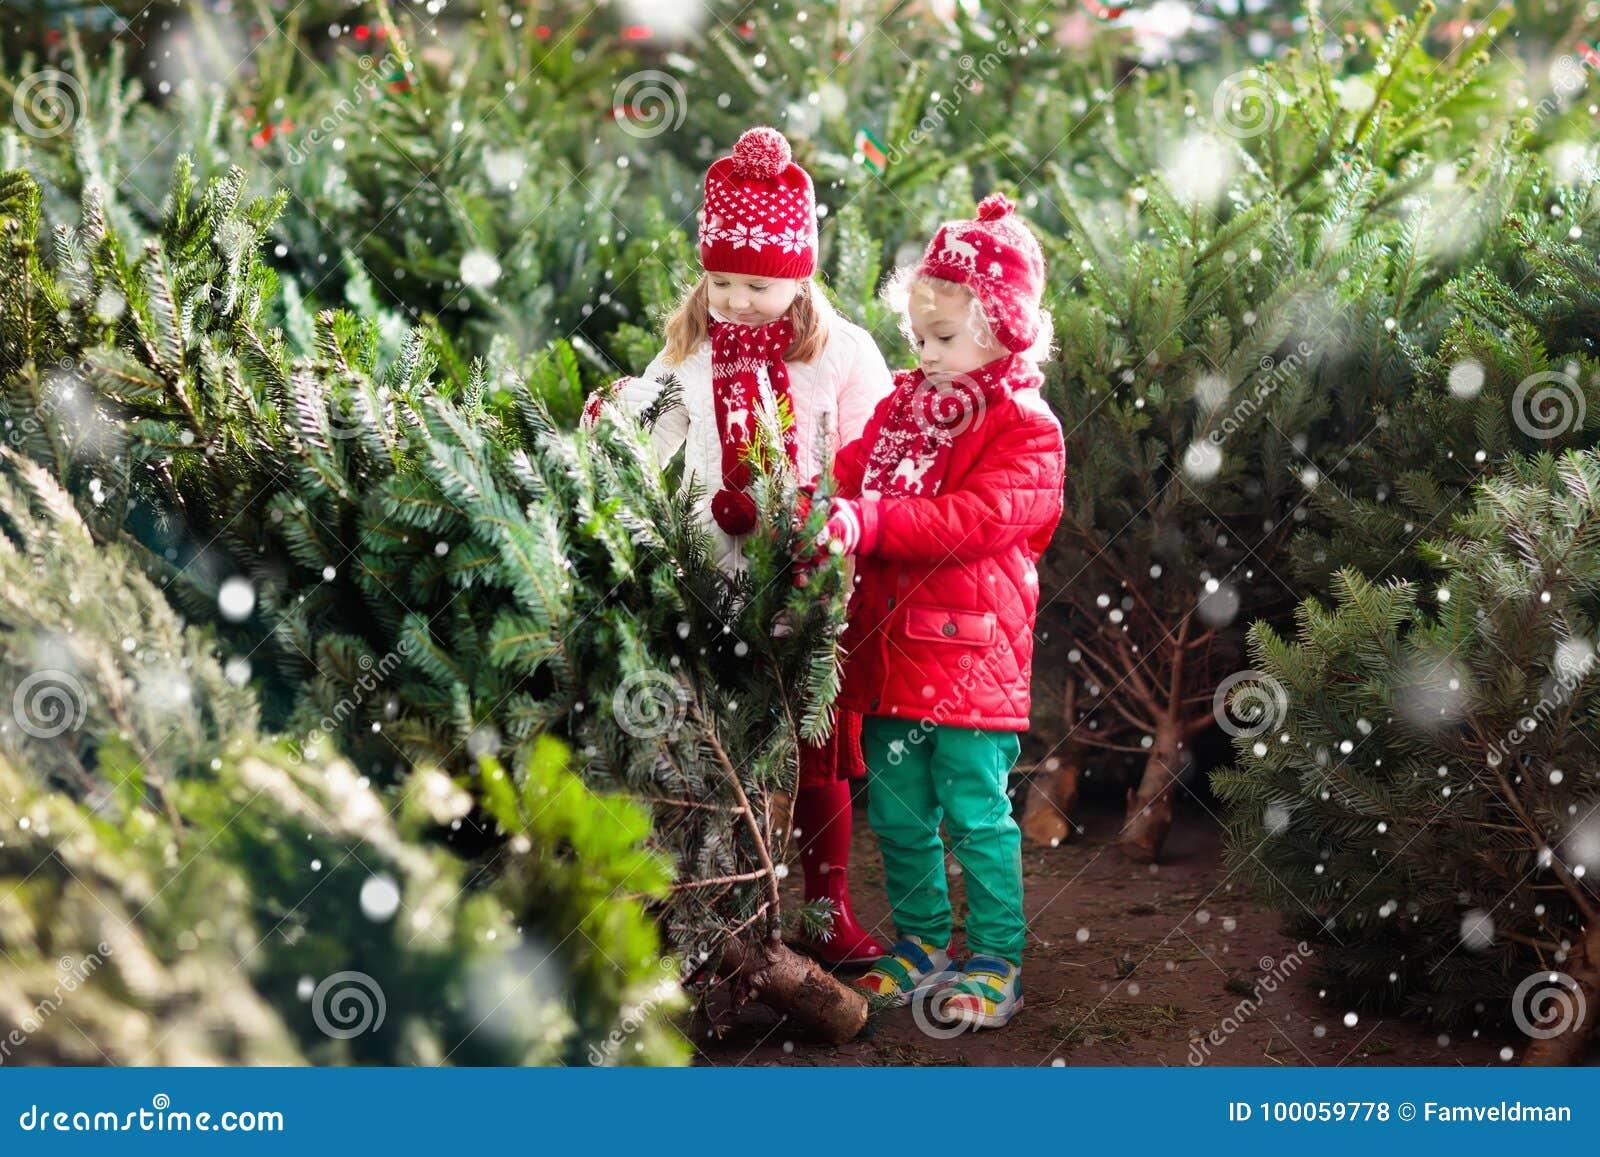 Kids Select Christmas Tree. Family Buying Xmas Tree. Stock Photo ...